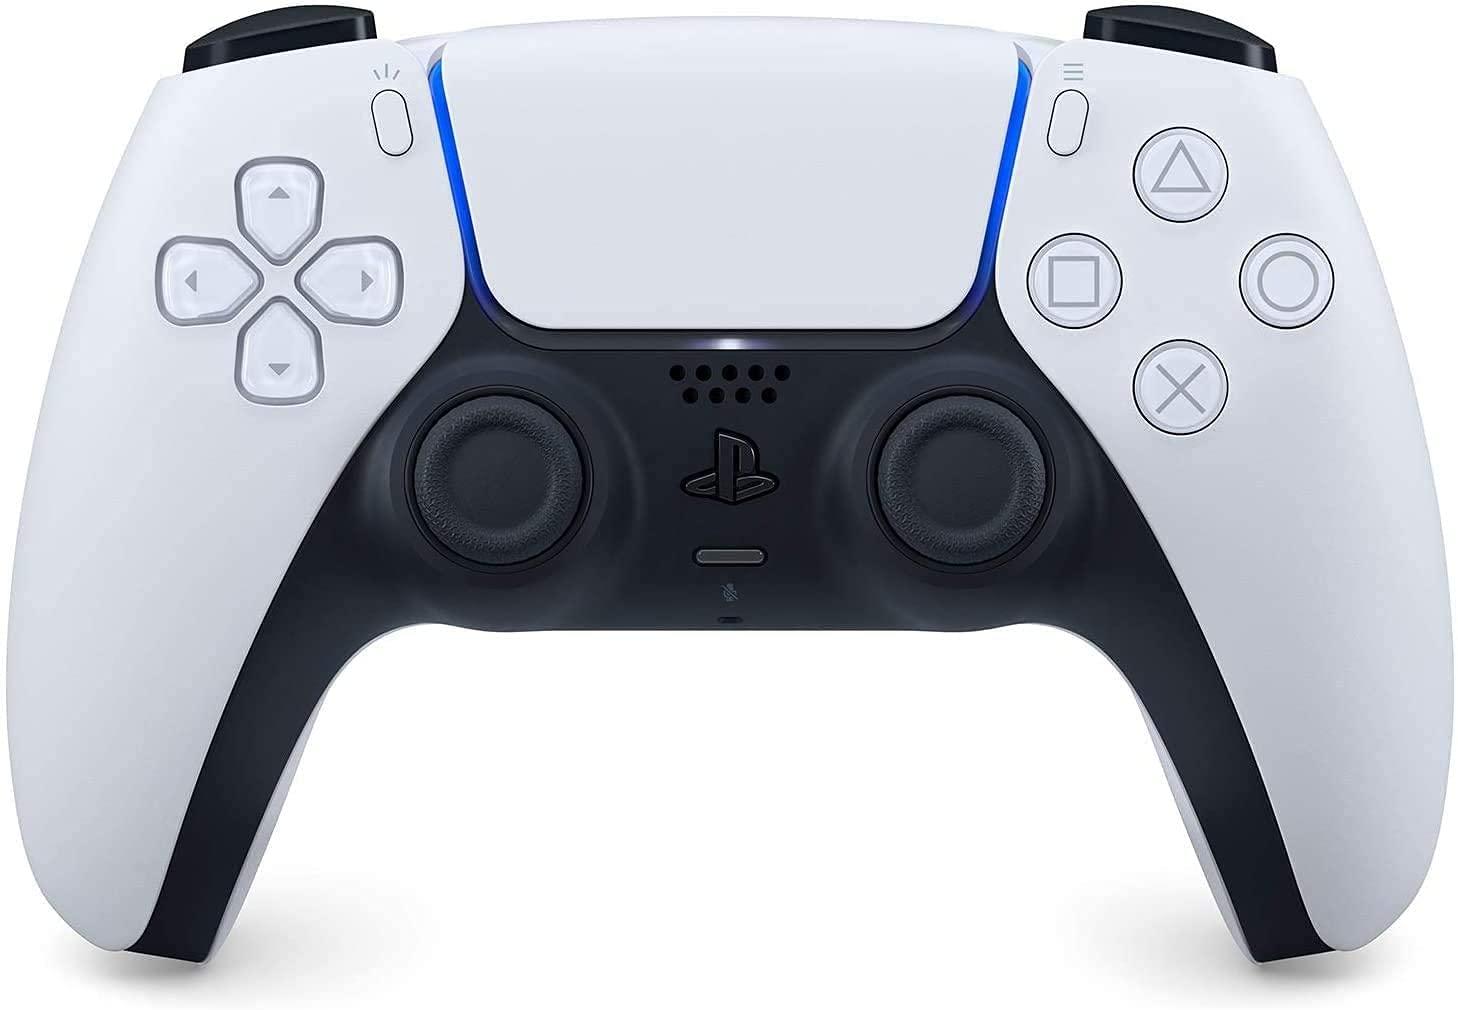 Mando inalámbrico DualSense PS5